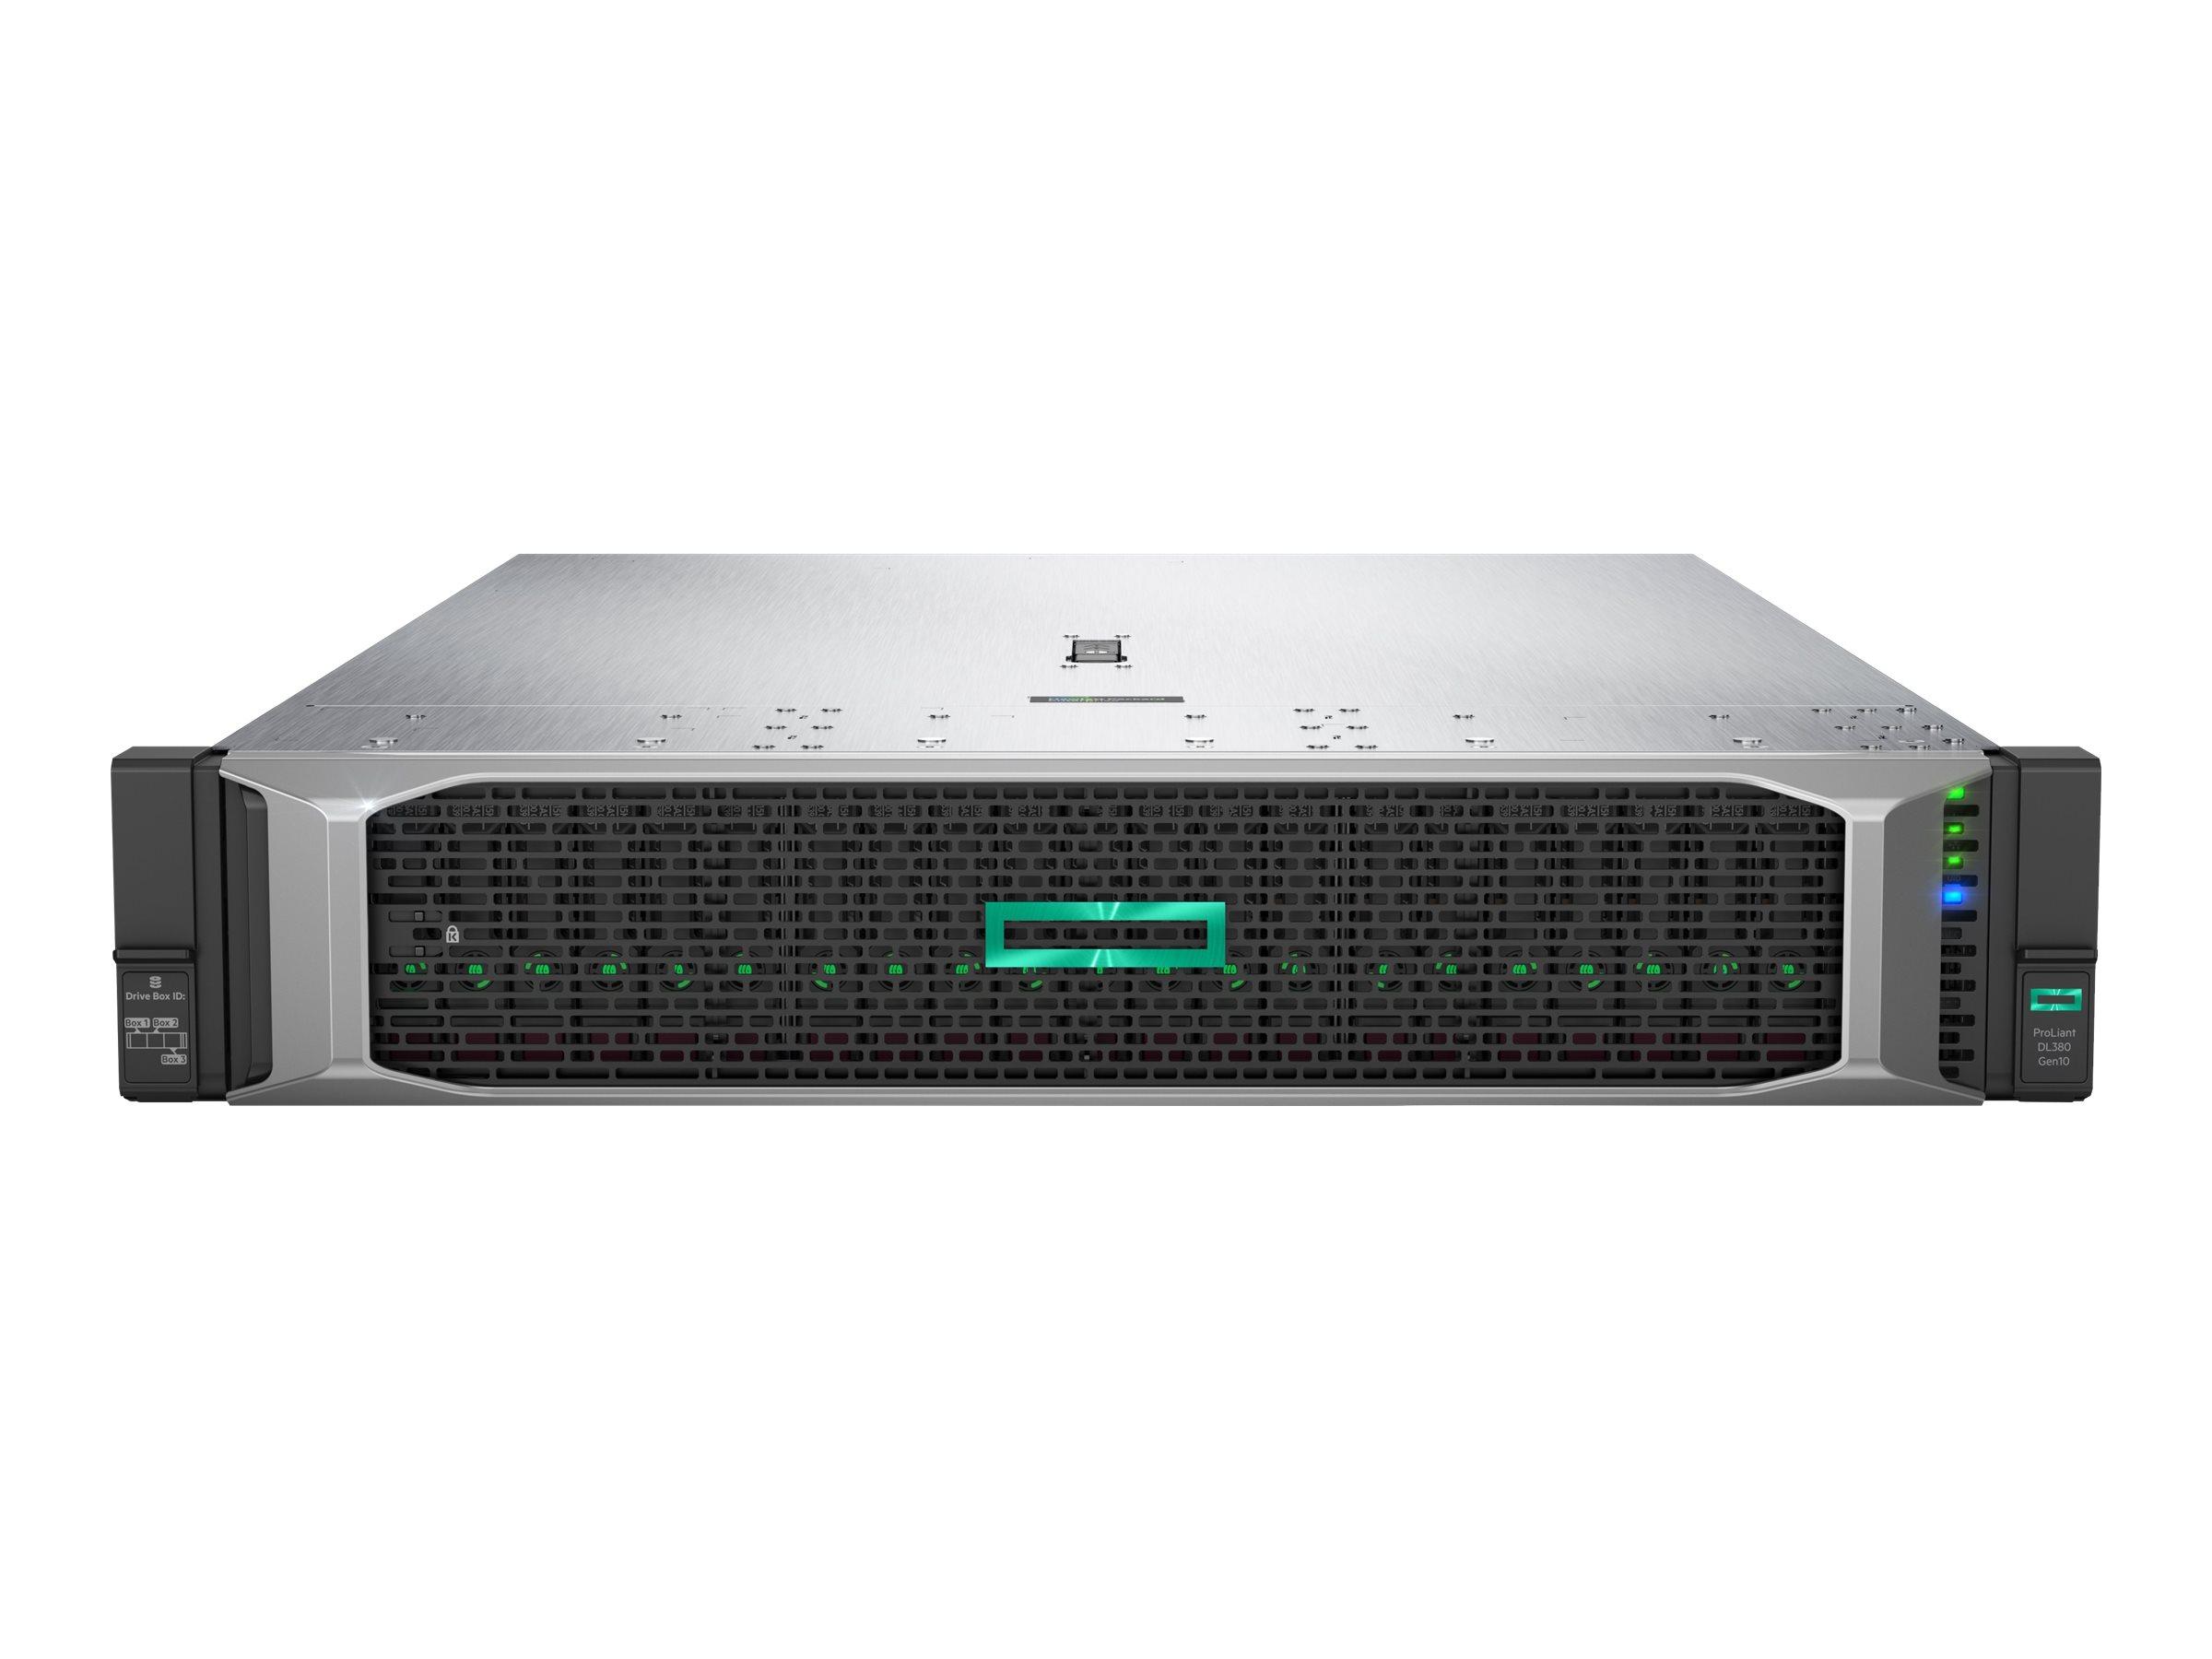 "Vorschau: HP Enterprise ProLiant DL380 Gen10 SMB Networking Choice - Server - Rack-Montage - 2U - zweiweg - 1 x Xeon Gold 5218R / 2.1 GHz - RAM 32 GB - SATA - Hot-Swap 6.4 cm (2.5"")"